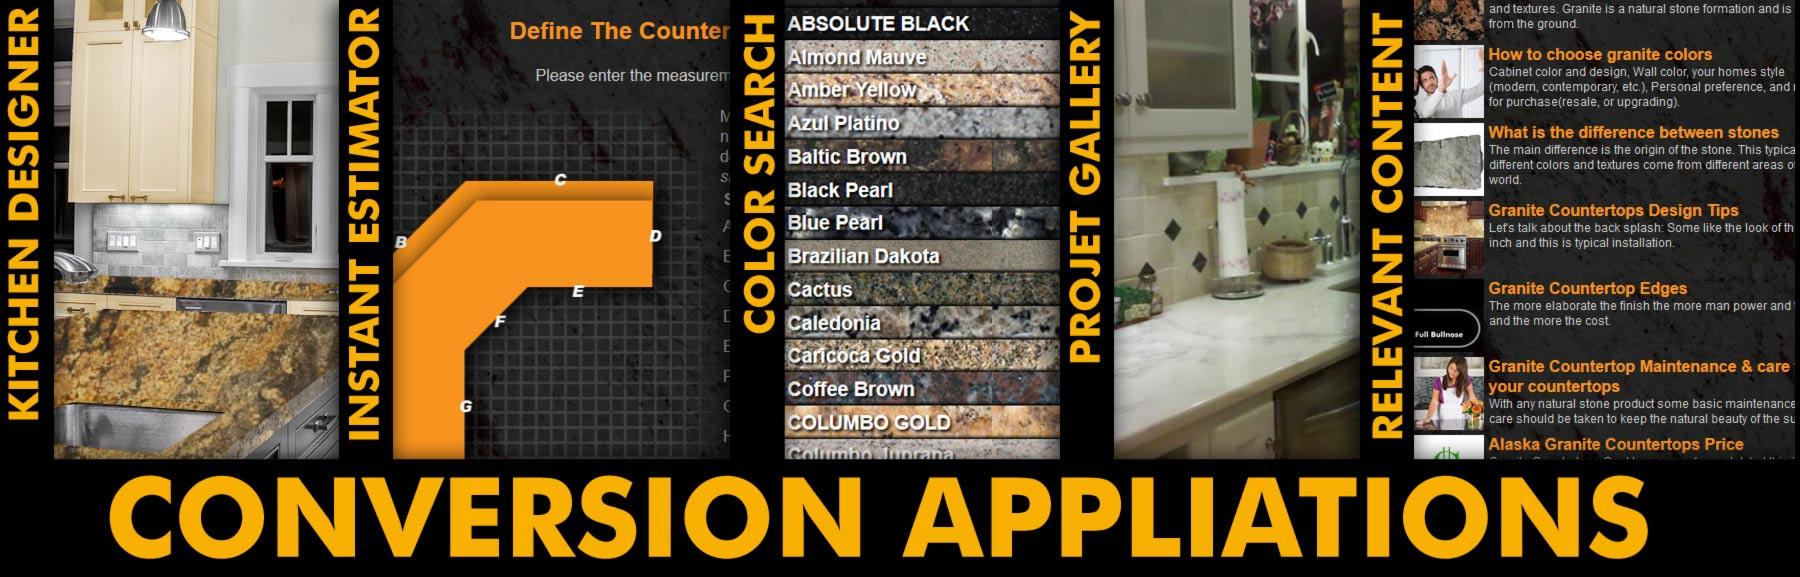 wp-Granite-Countertop-Marketing-applicaitons